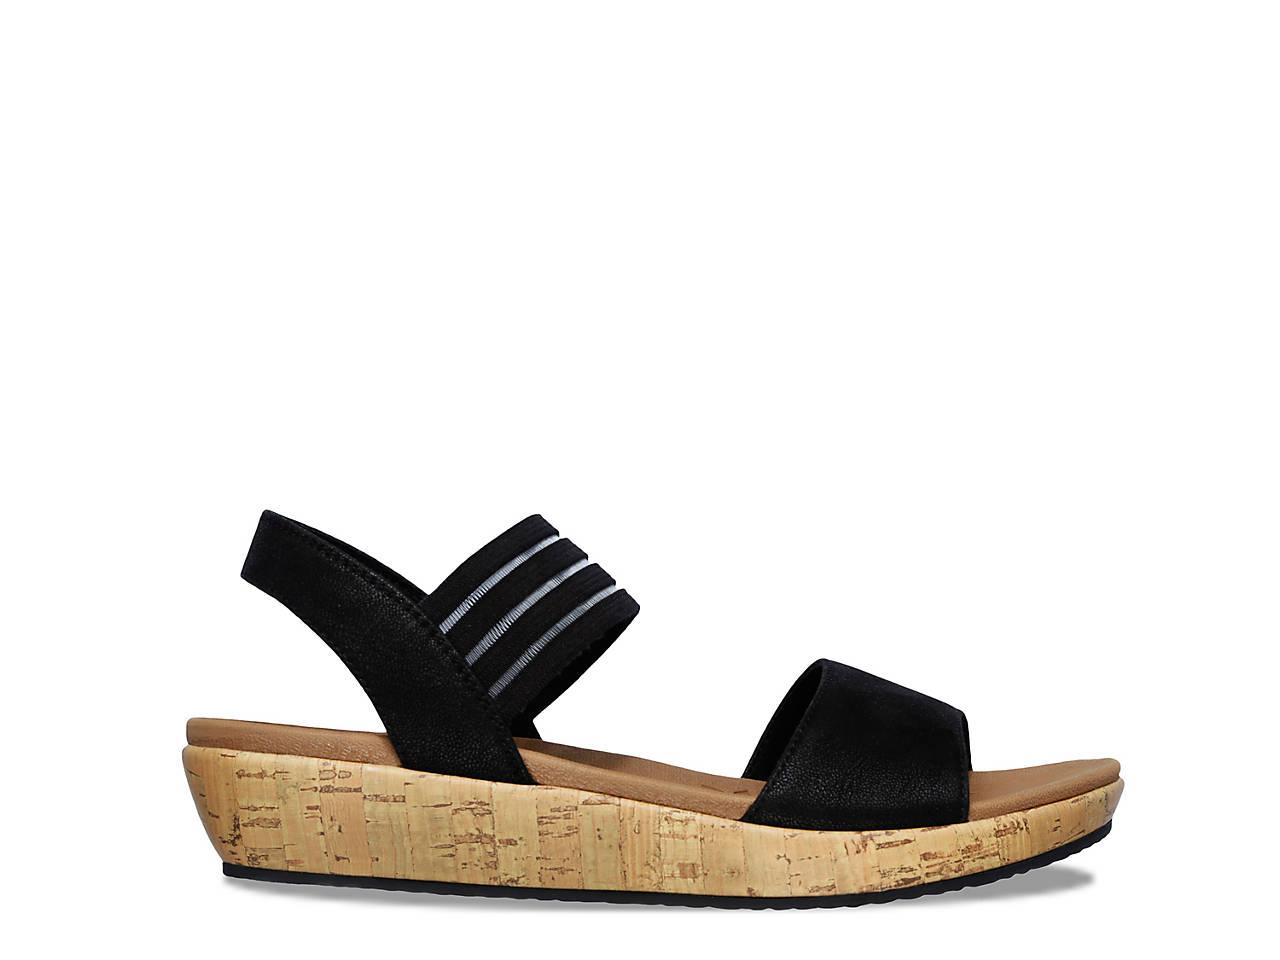 bcc3c7bf Skechers Cali Brie Lo'Profile Sandal Women's Shoes   DSW